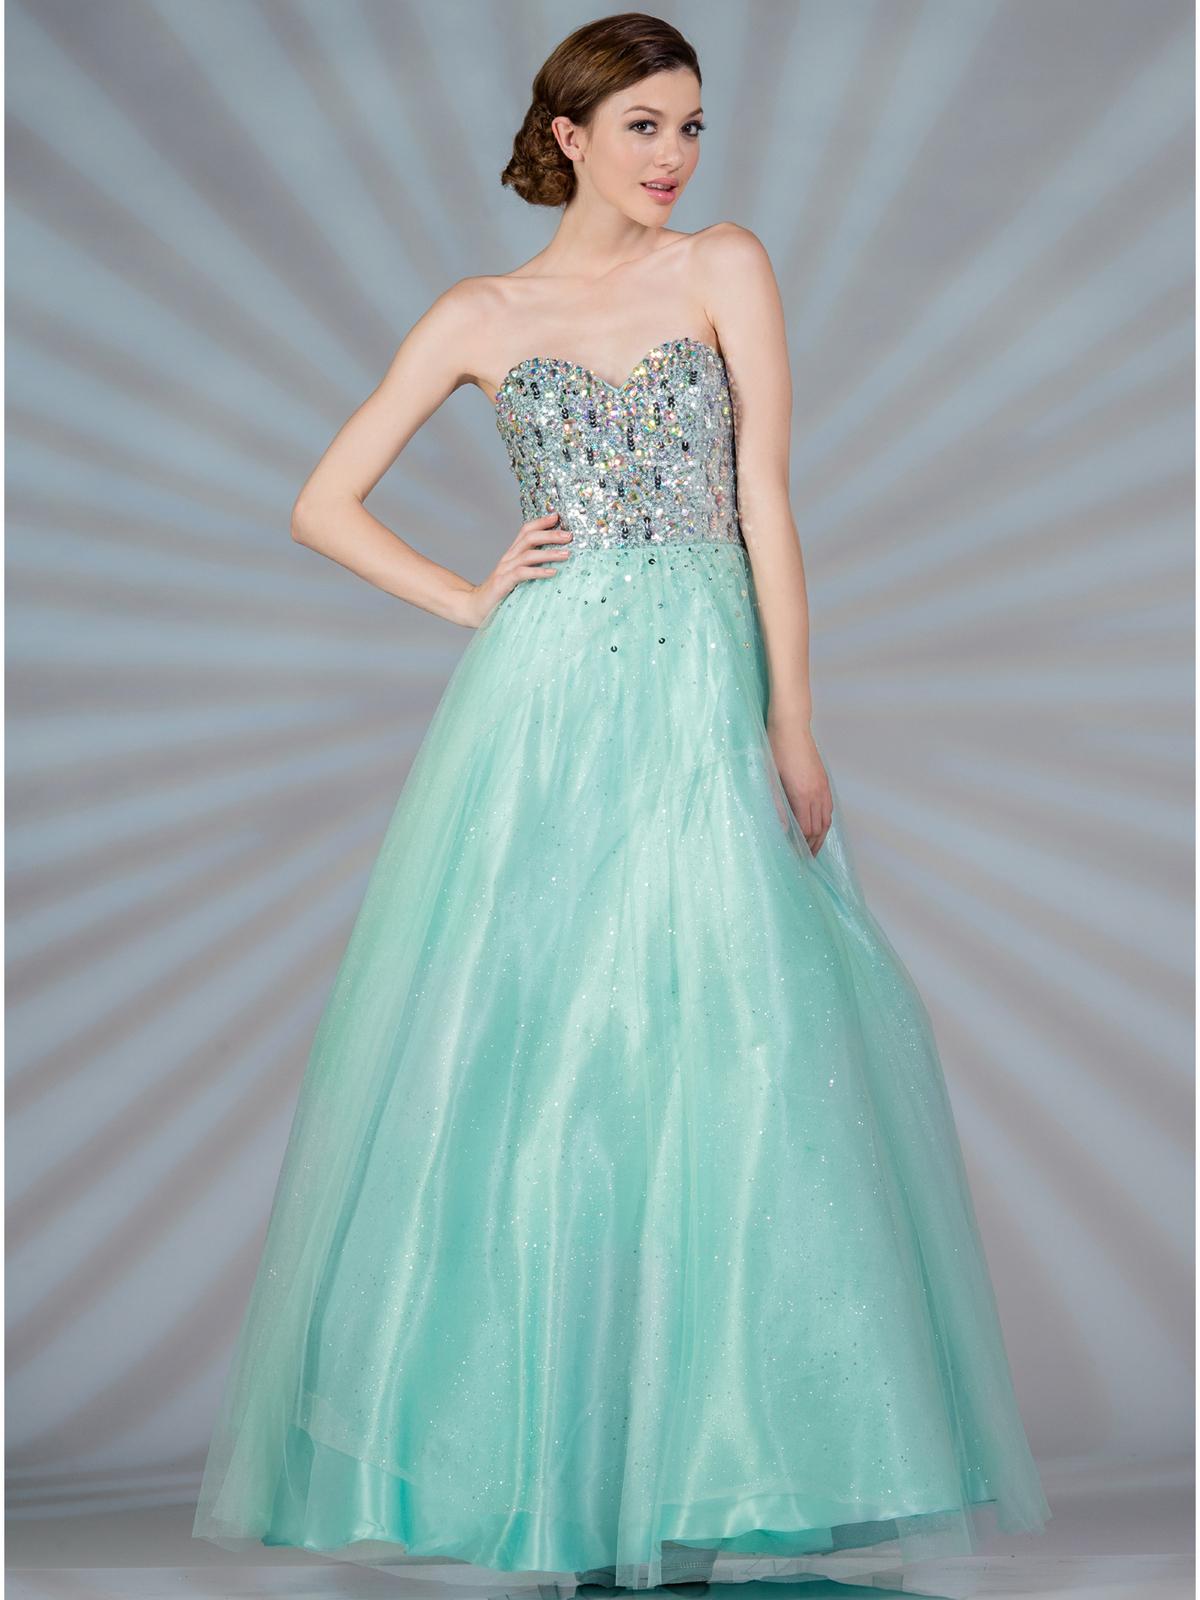 Fancy Prom Dresses In Chesapeake Va Elaboration - Wedding Dress ...